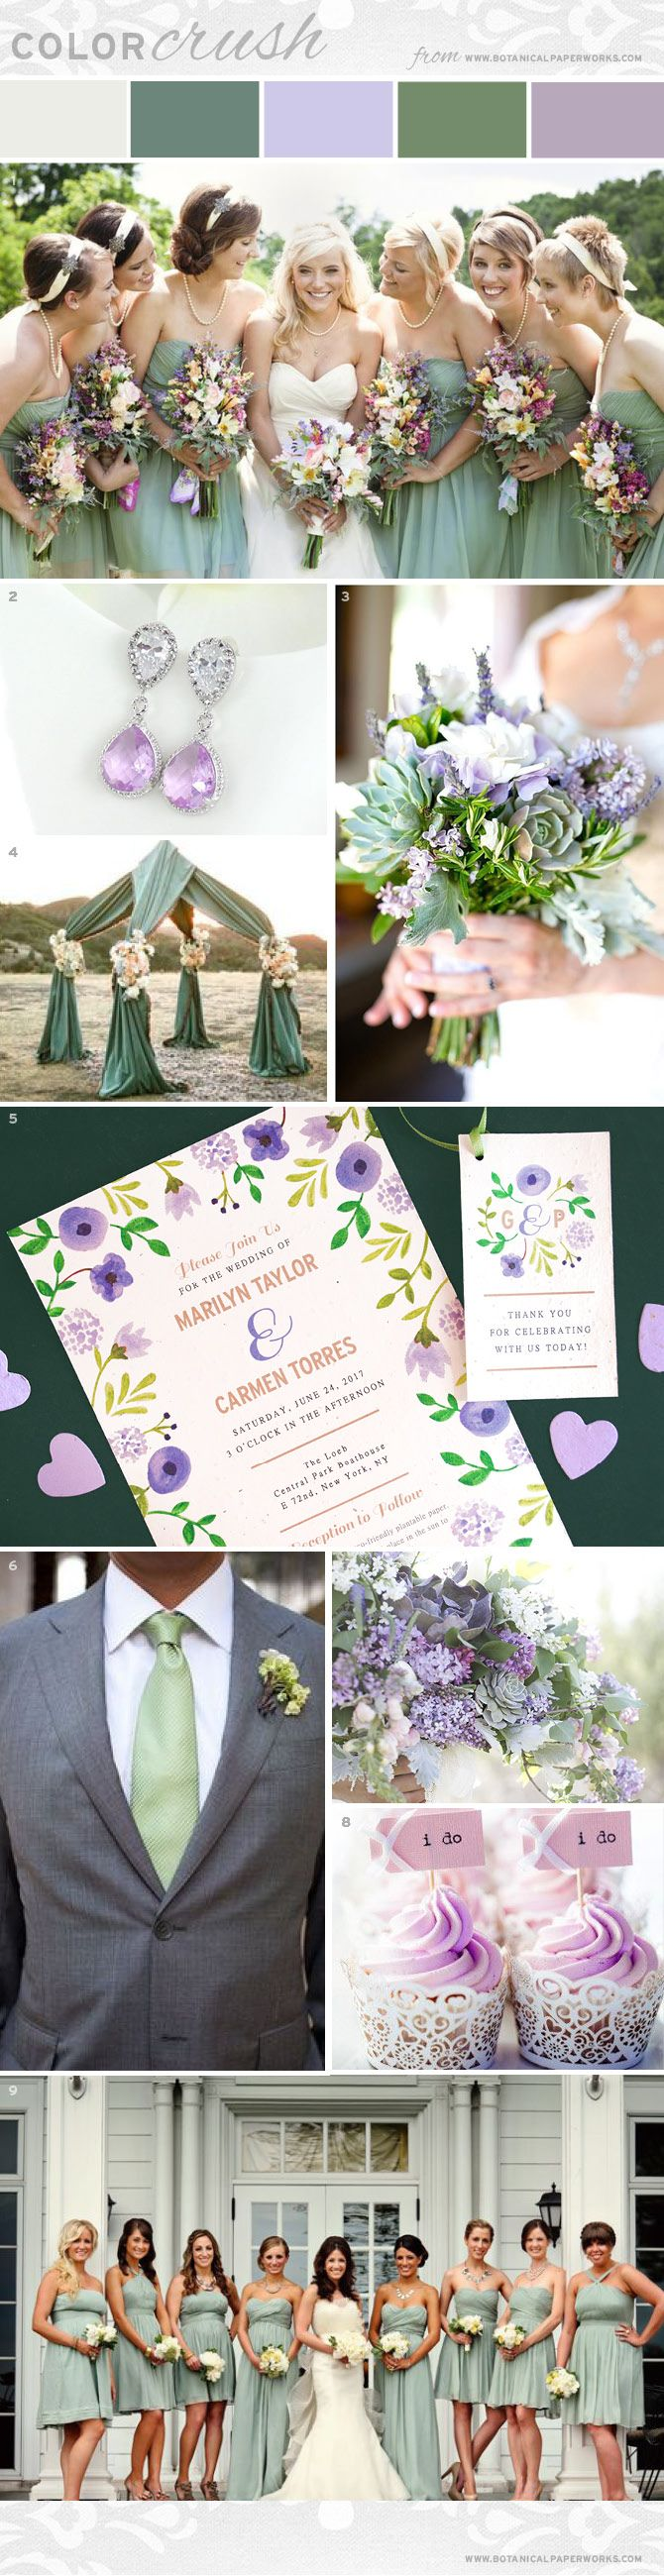 inspiration board} Color Crush - Sage, Lilac & White | Pinterest ...